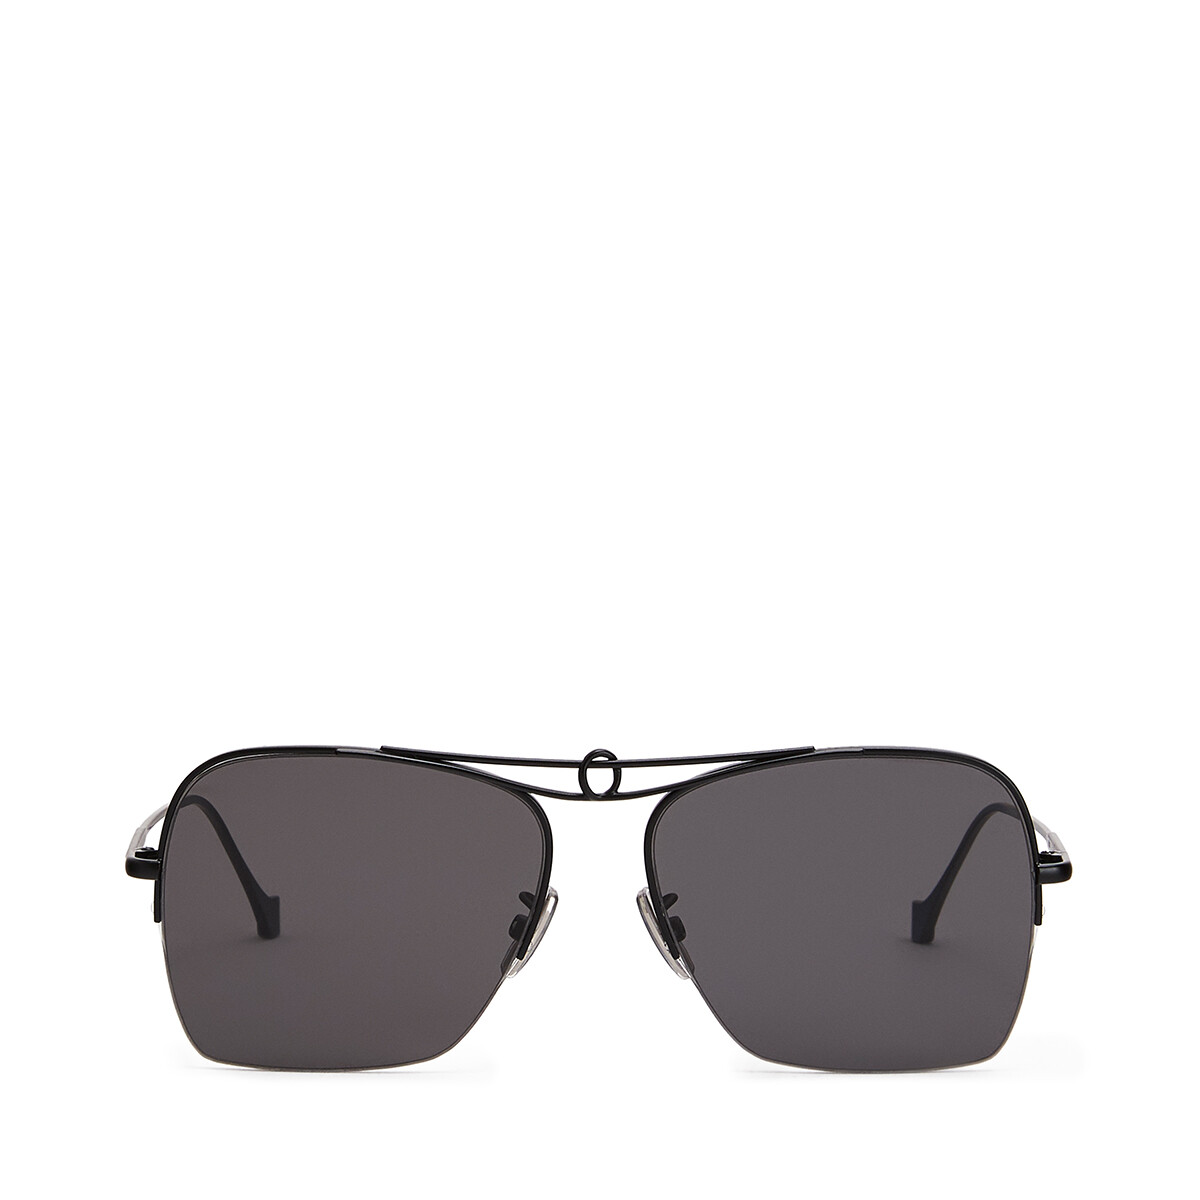 LOEWE Gafas Nudo Pilot Cuadradas Negro Mate/Humo front